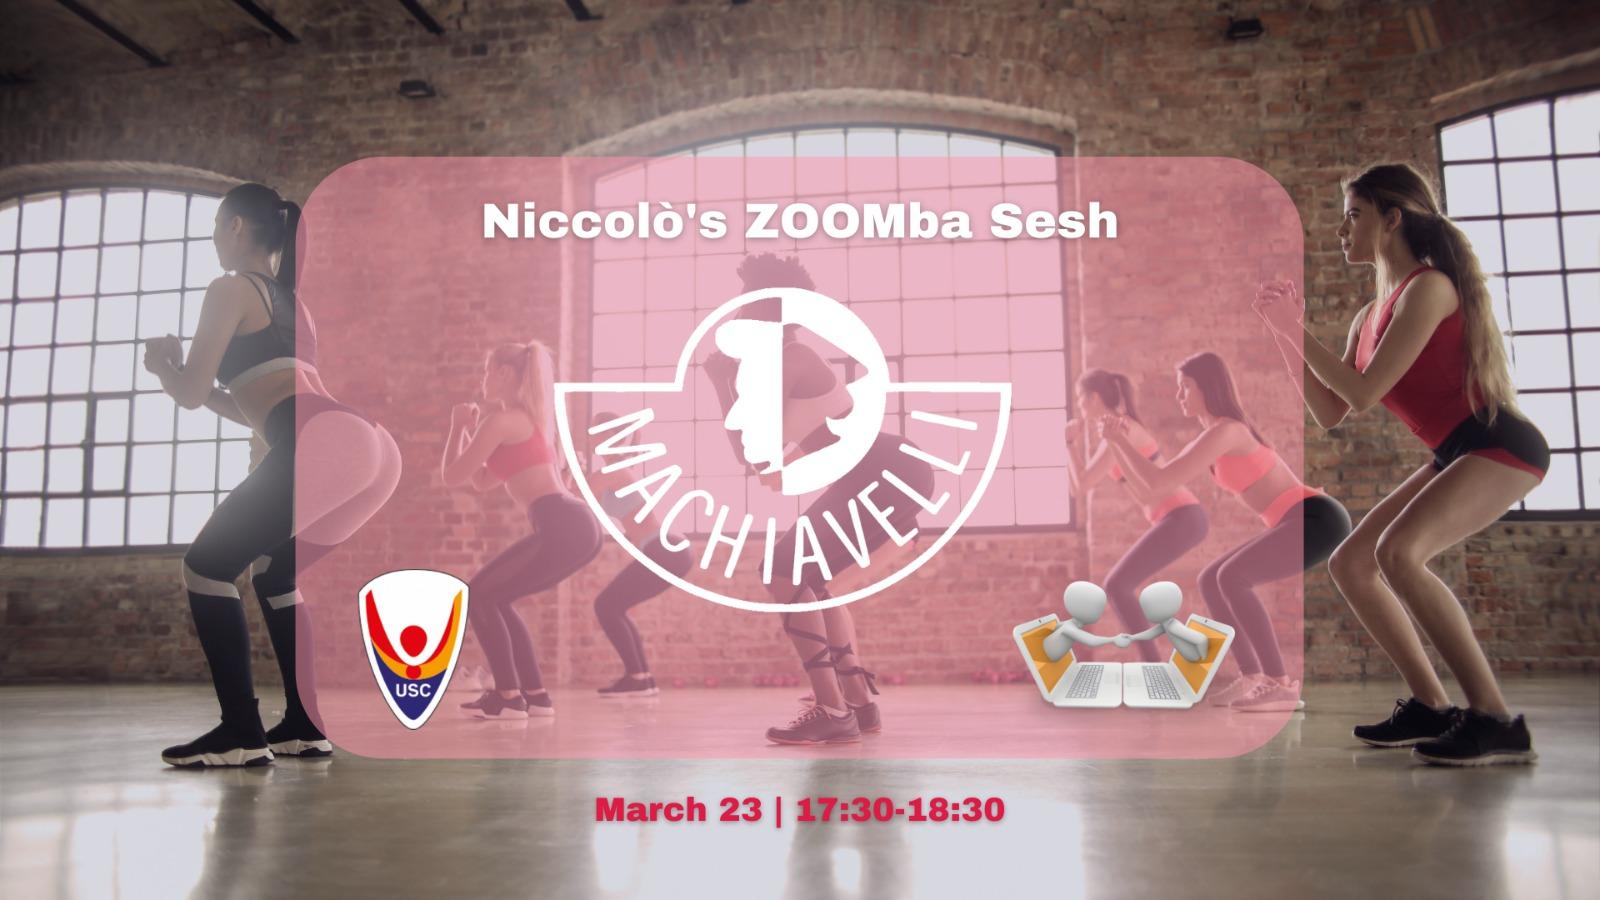 Niccolò's ZOOMba sesh